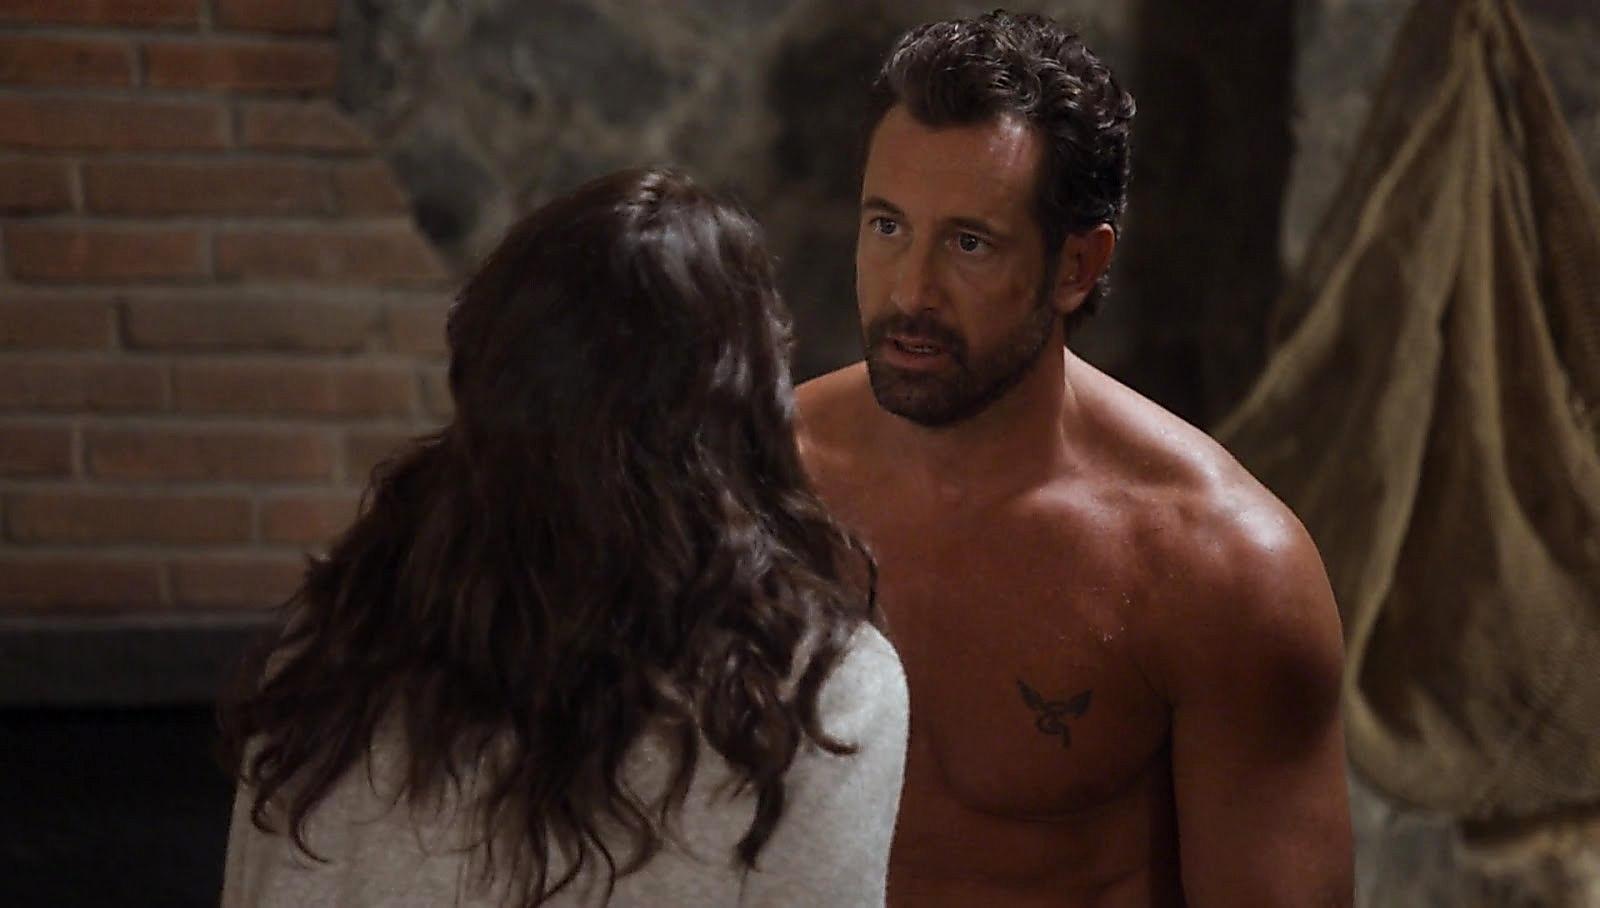 Gabriel Soto sexy shirtless scene December 1, 2017, 1pm